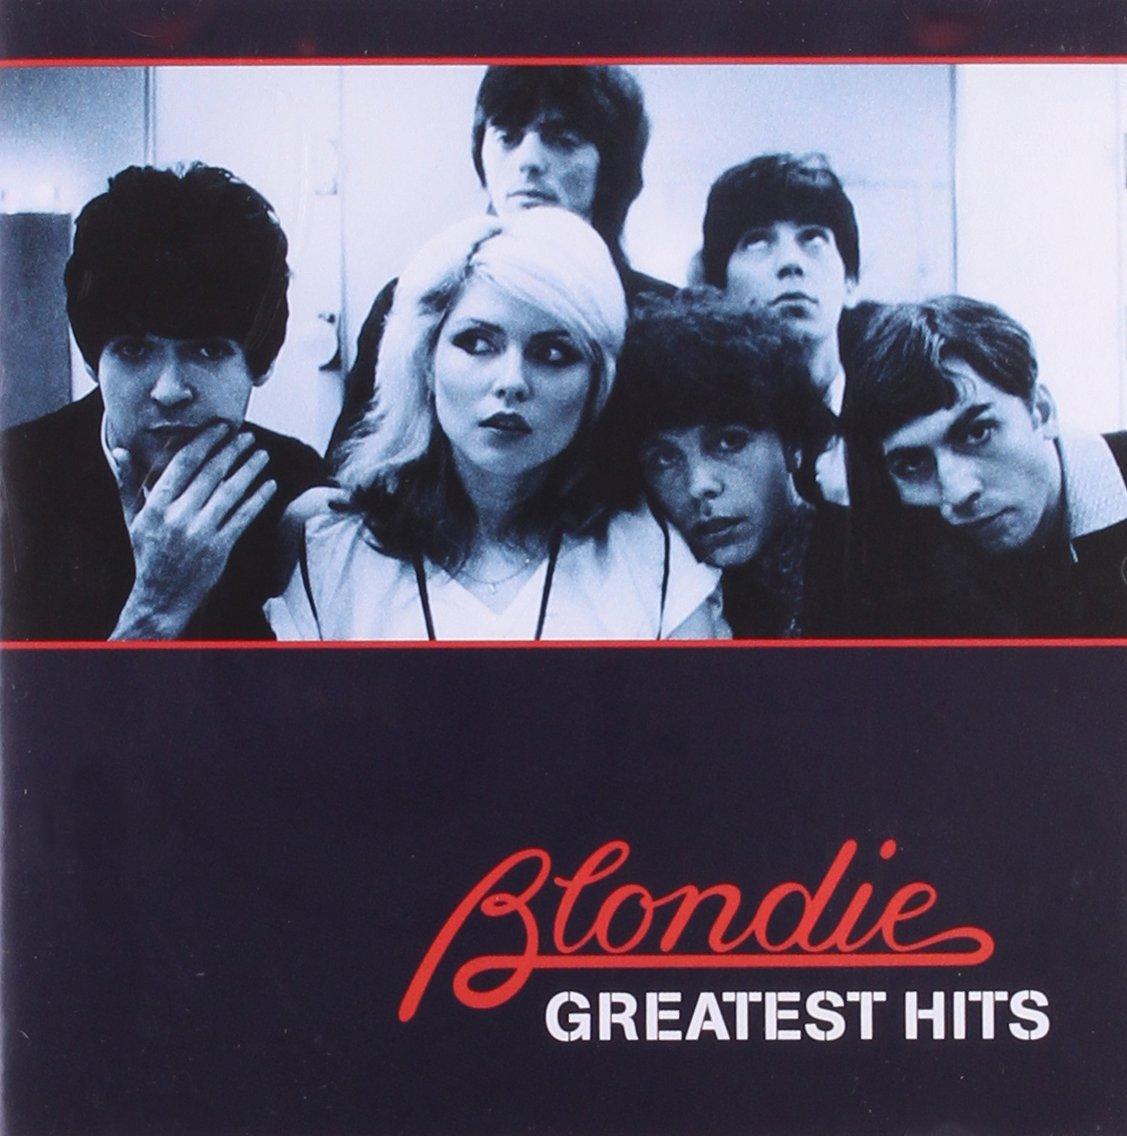 Blondie, Greatest Hits (CD recopilatorio)